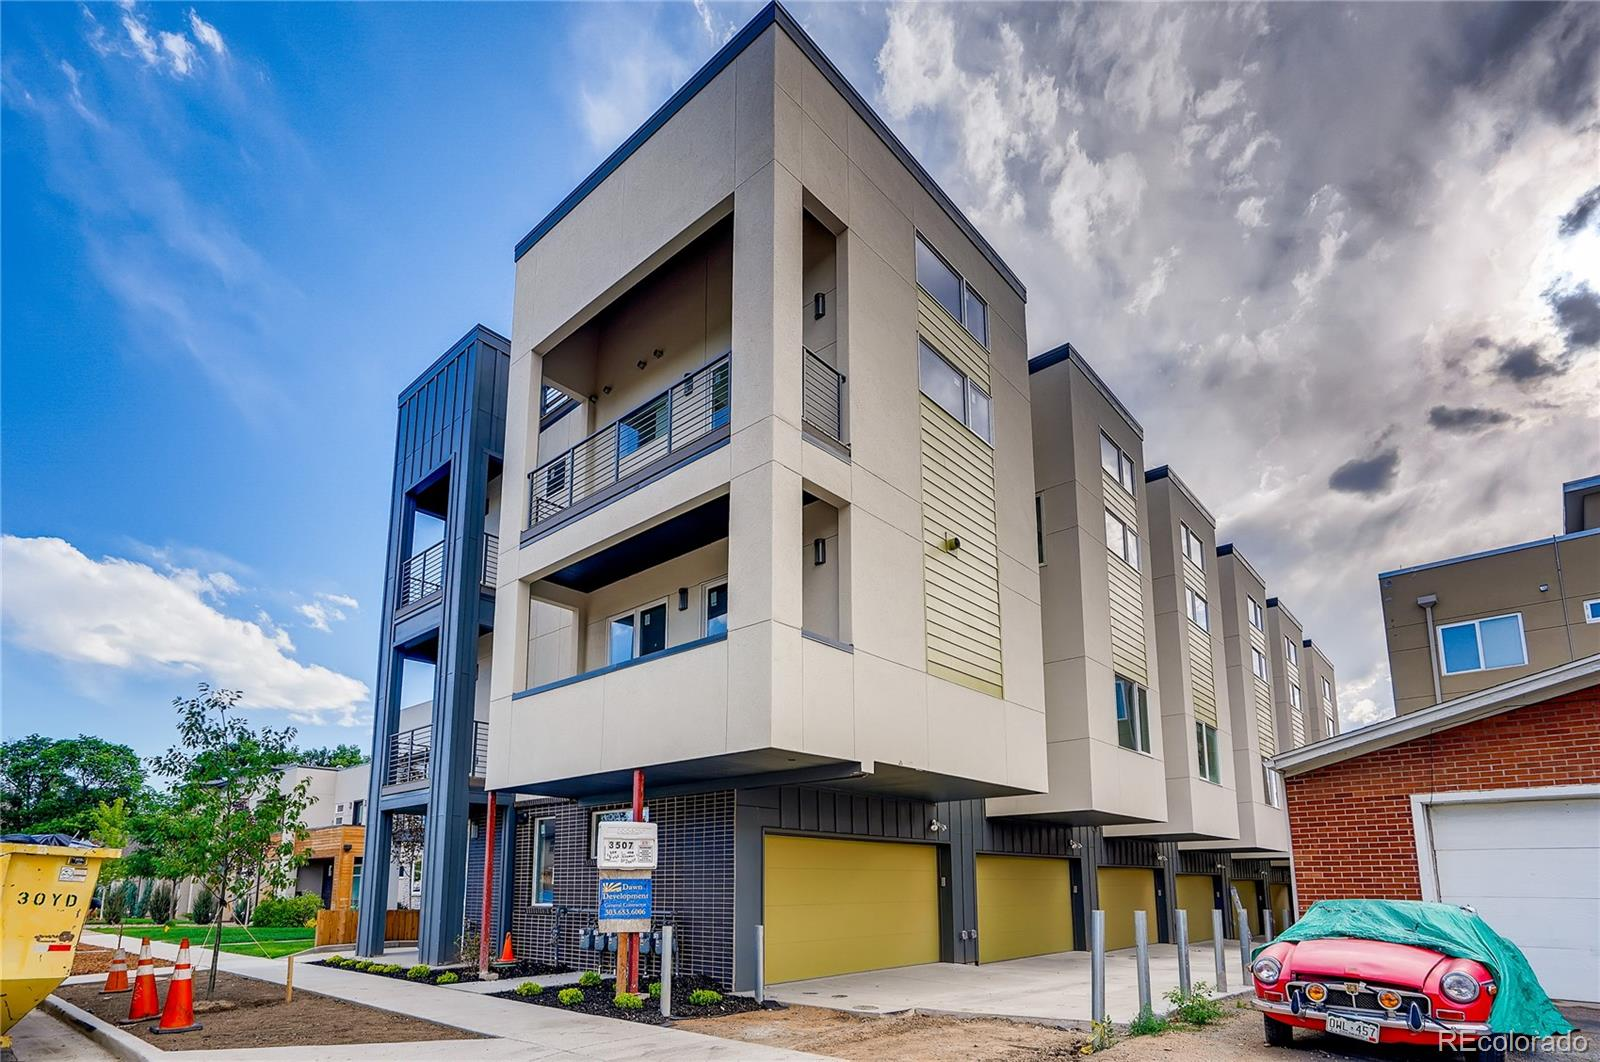 3507 S Ogden Street #D Property Photo - Englewood, CO real estate listing